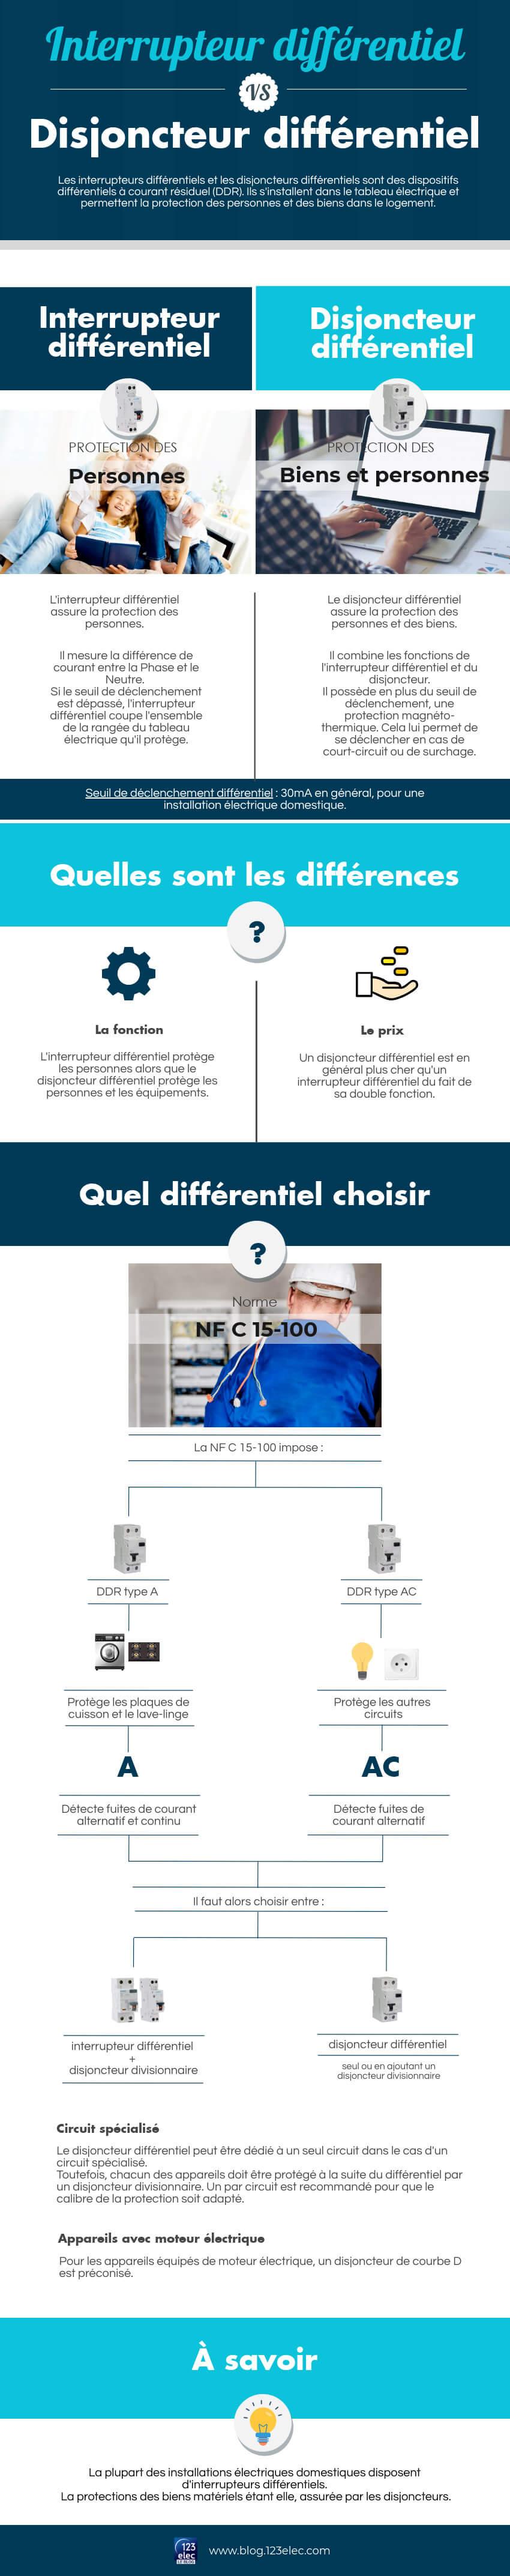 interrupteur diff rentiel vs disjoncteur diff rentiel blog 123elec. Black Bedroom Furniture Sets. Home Design Ideas